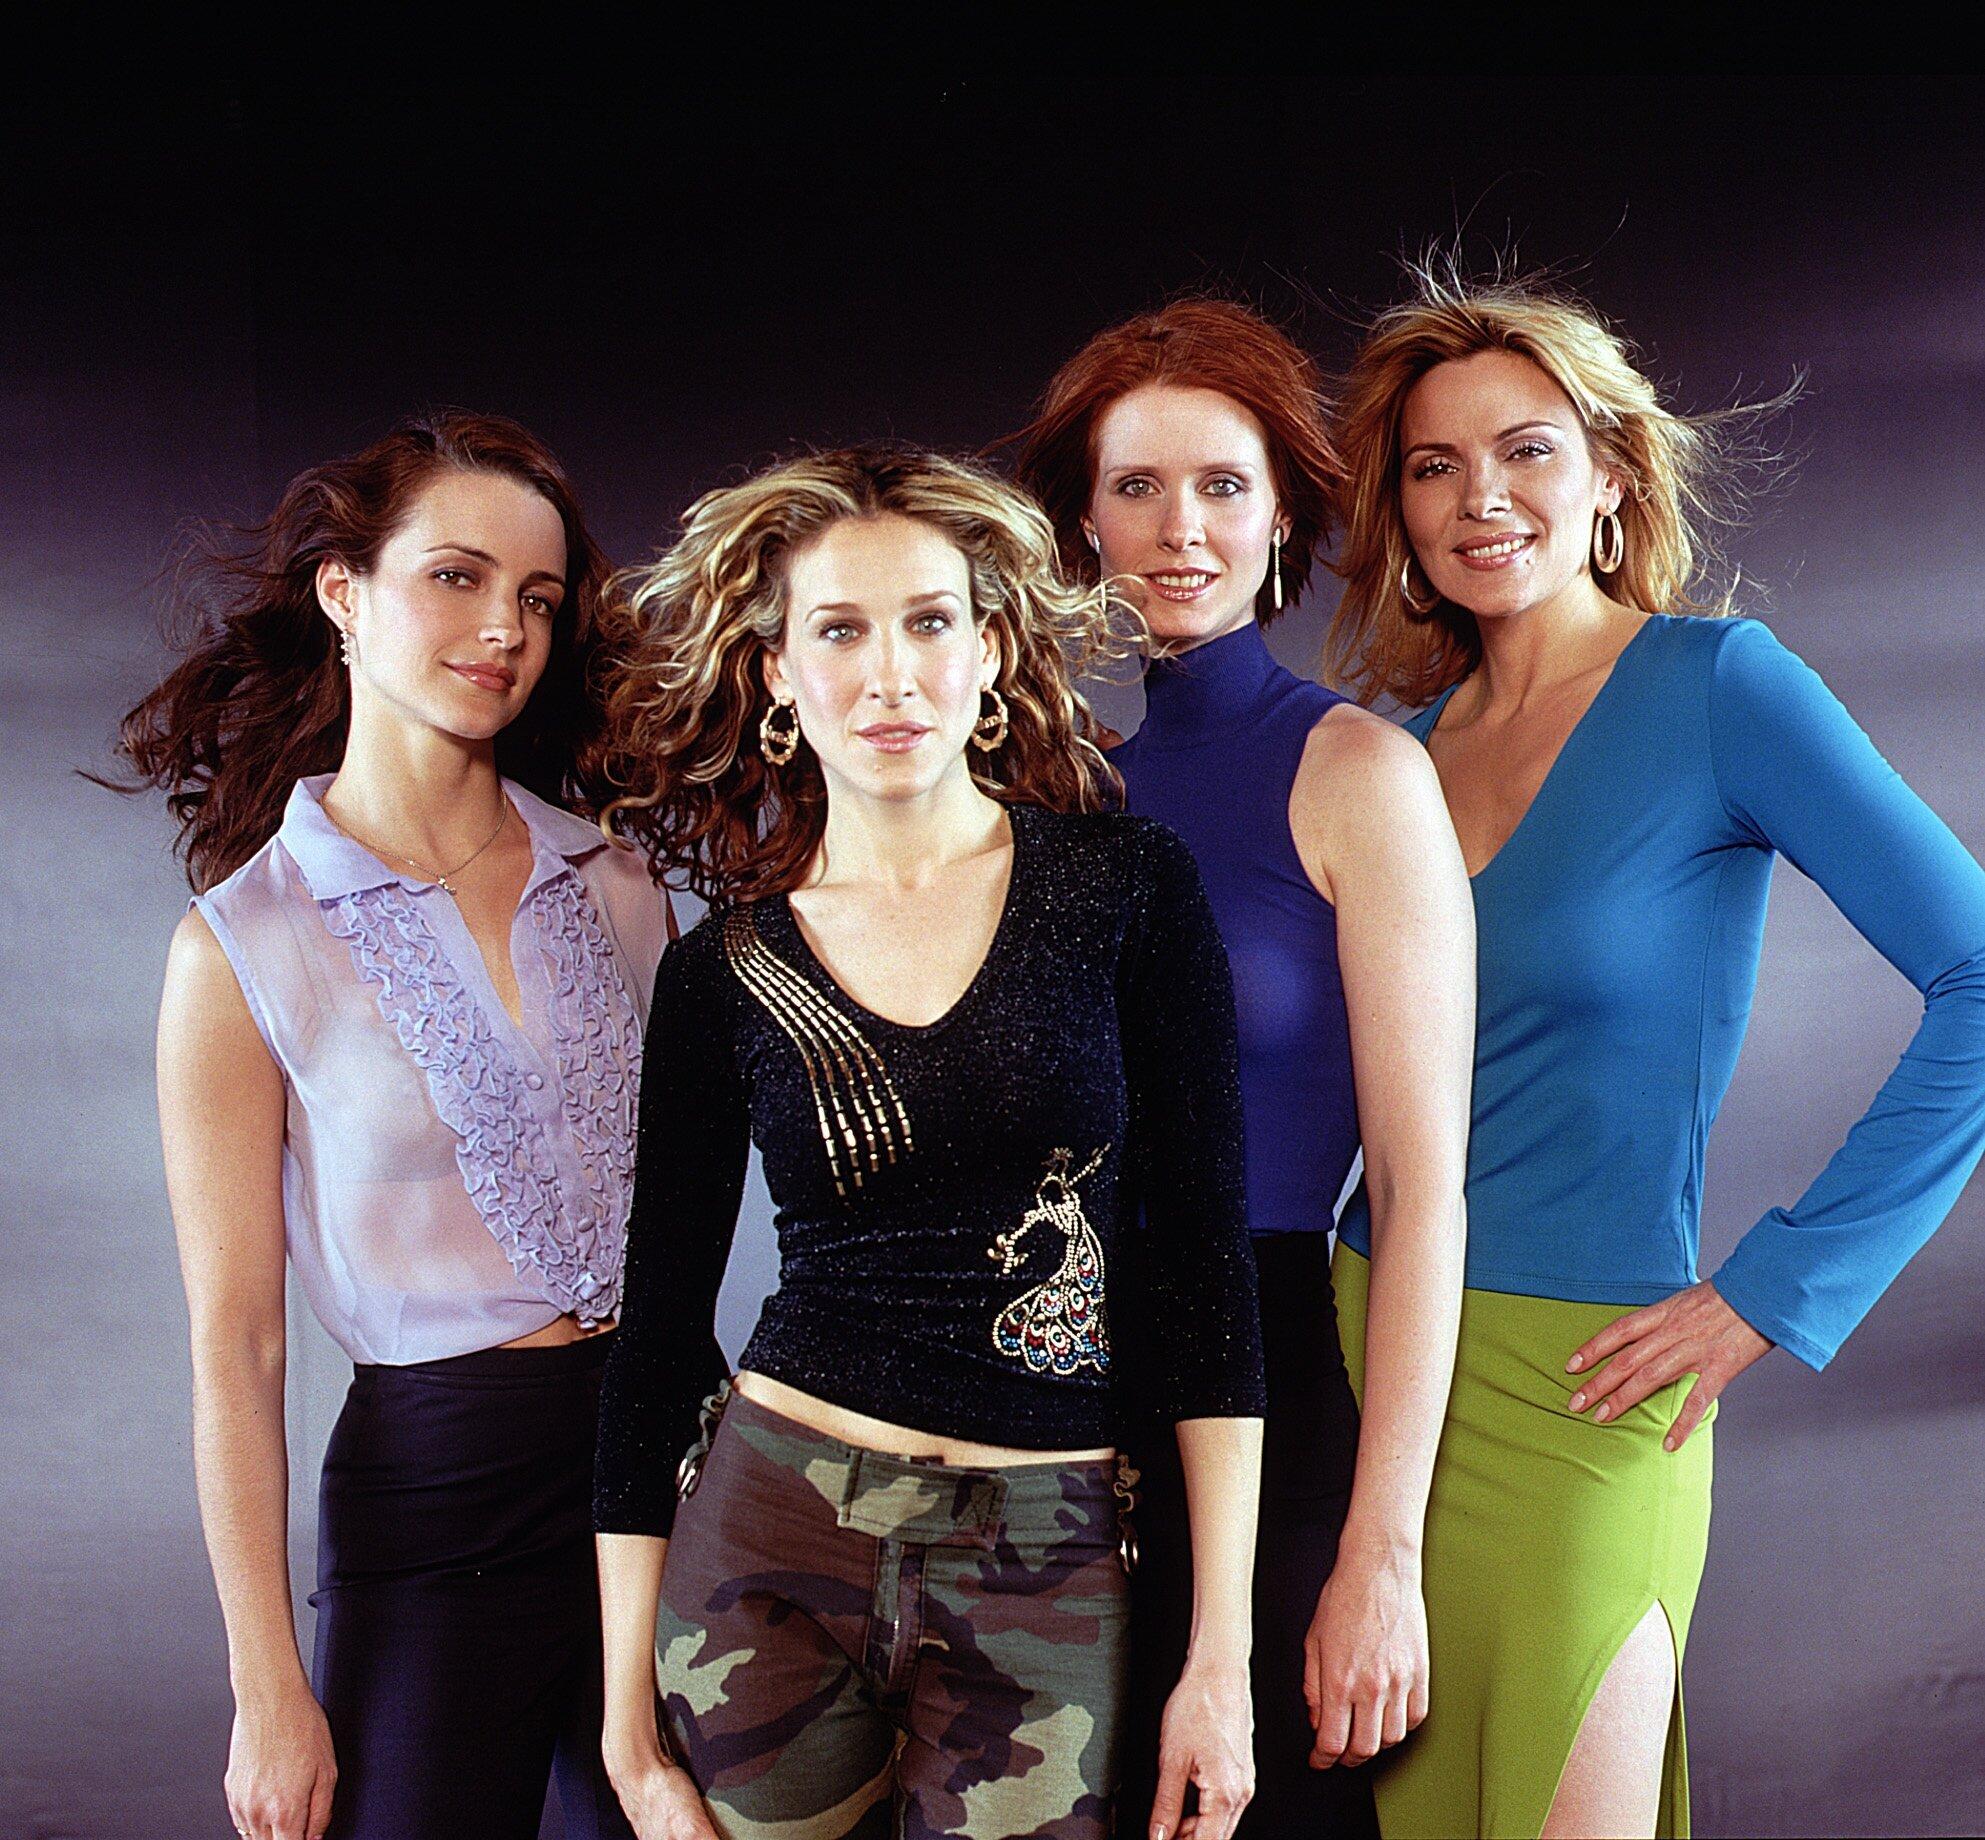 L-R: Kristin Davis, Sarah Jessica Parker, Cynthia Nixon and Kim Cattrall in Sex And The